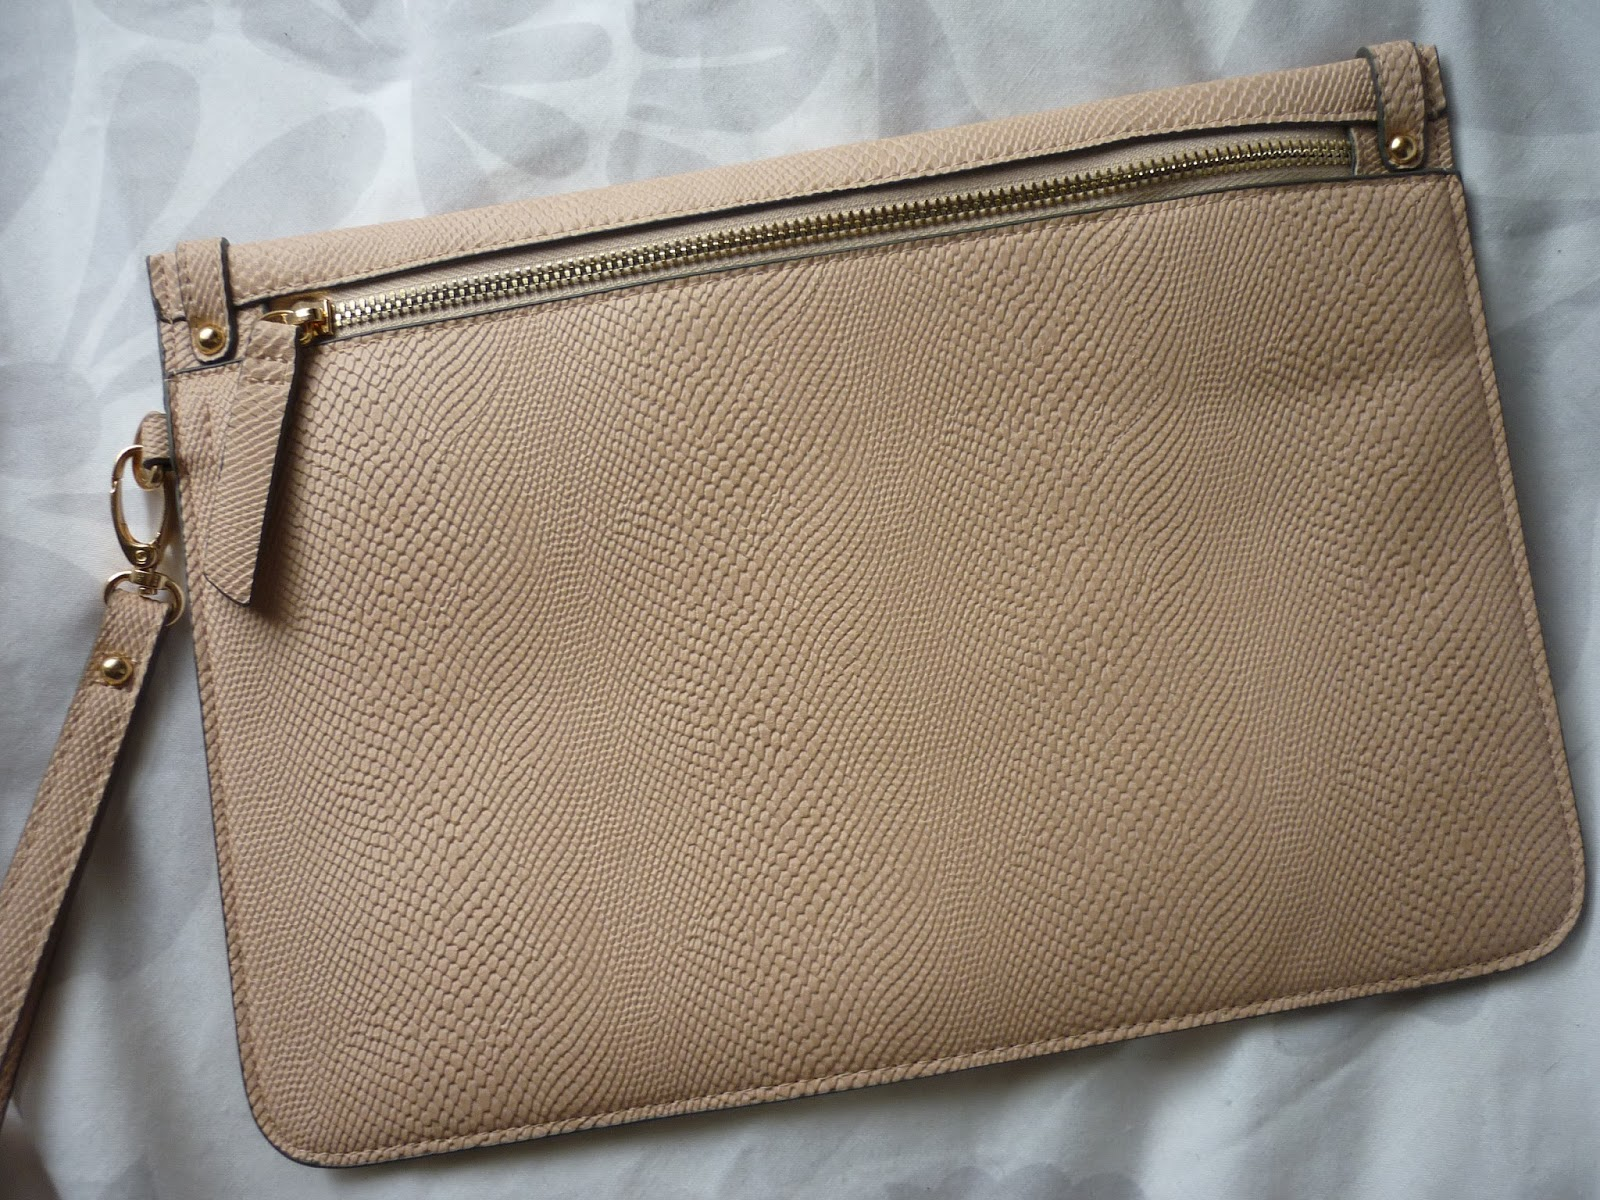 0db9ef6a13 Honeypot Blogs: Accessorize Snake Flat Clutch Bag | Fashion